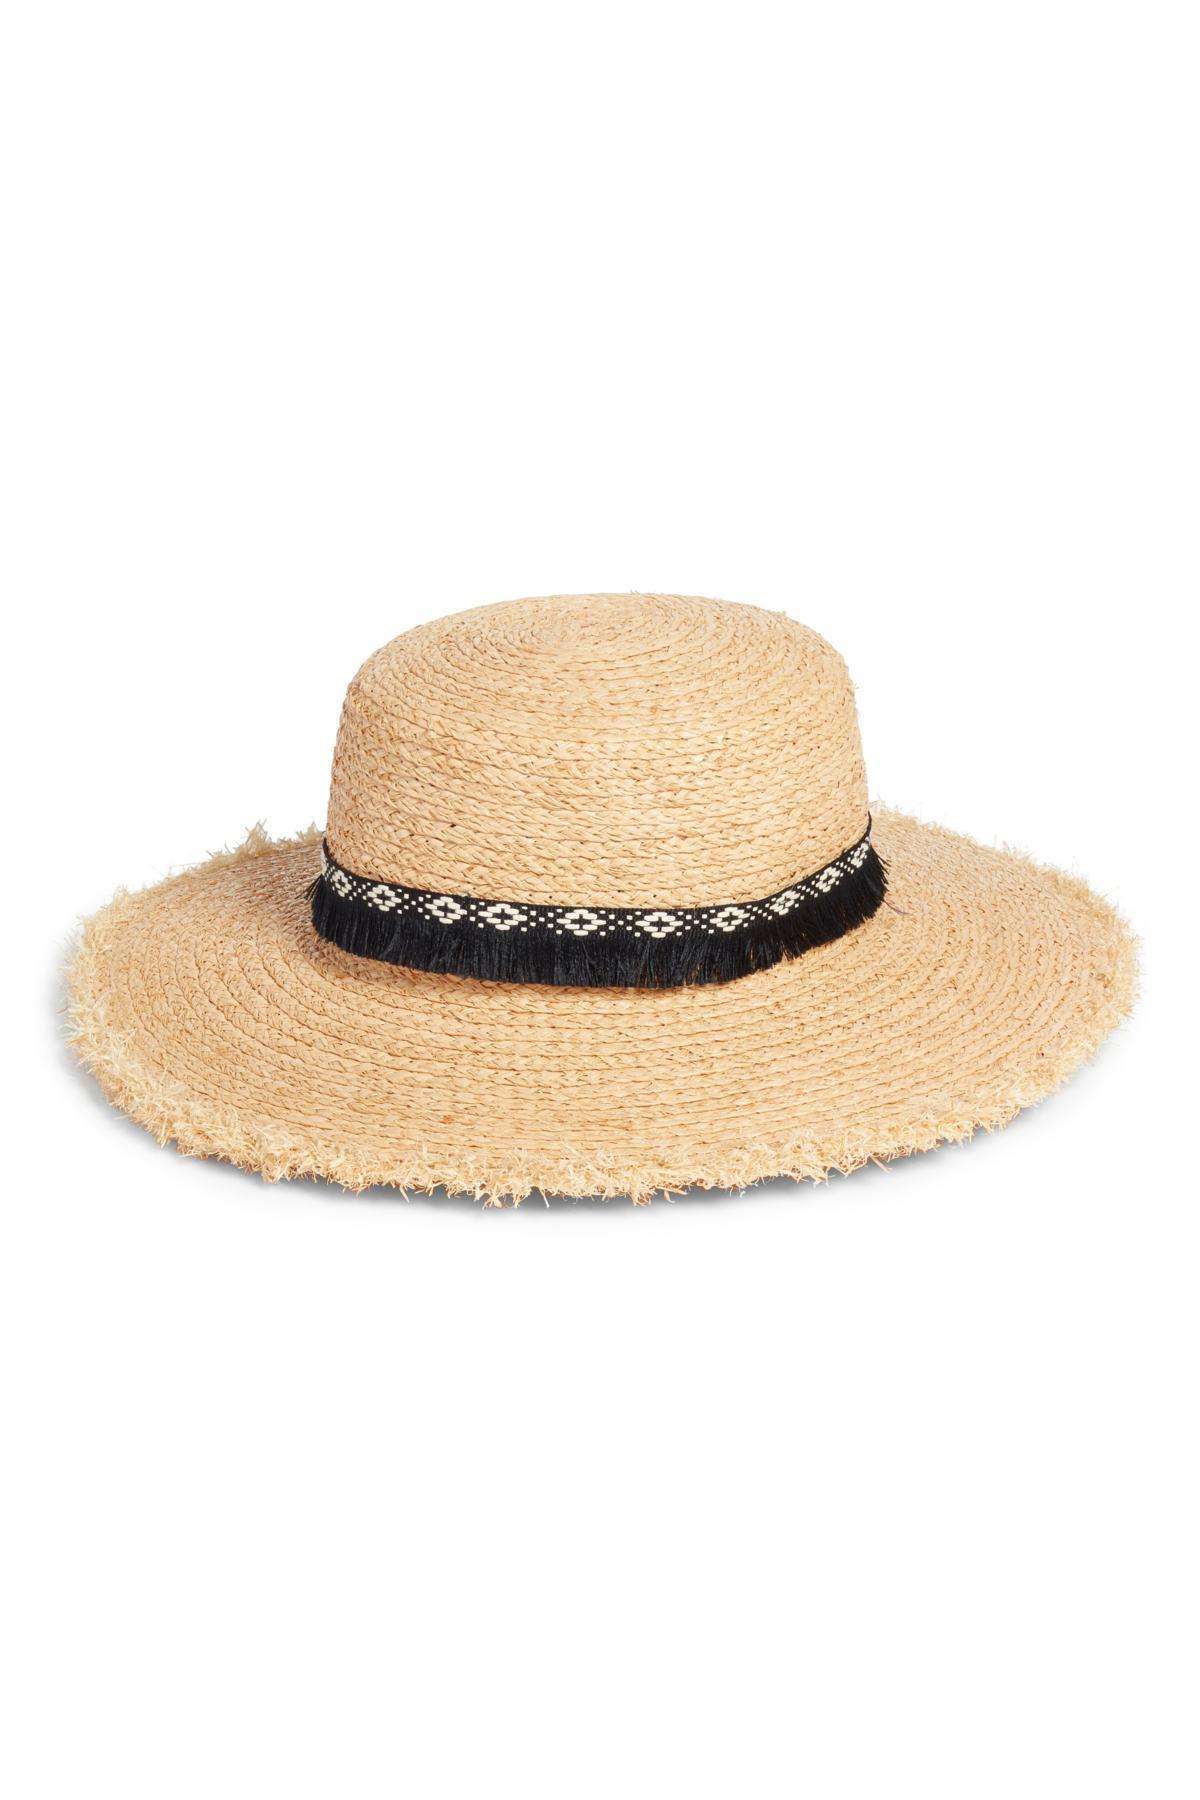 8fd941a7238 Lyst - Caslon Fringe Trim Straw Boater Hat in Natural - Save 4%